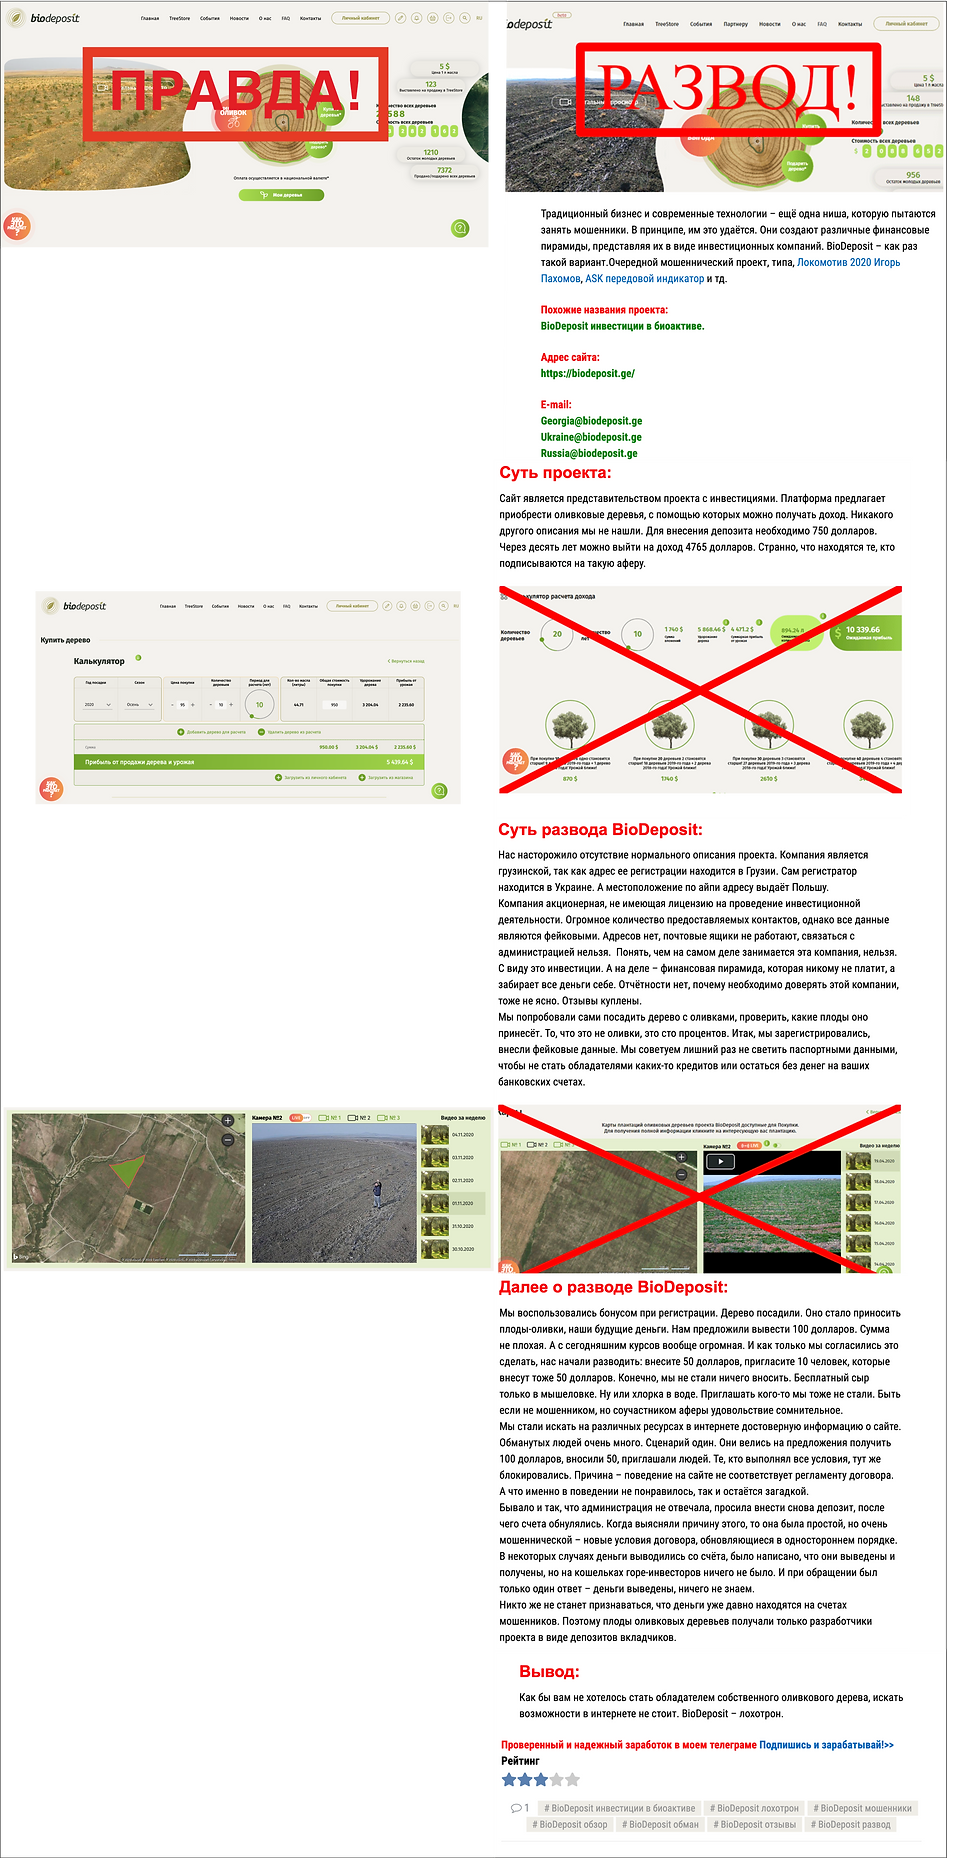 biodeposit_razvod.png